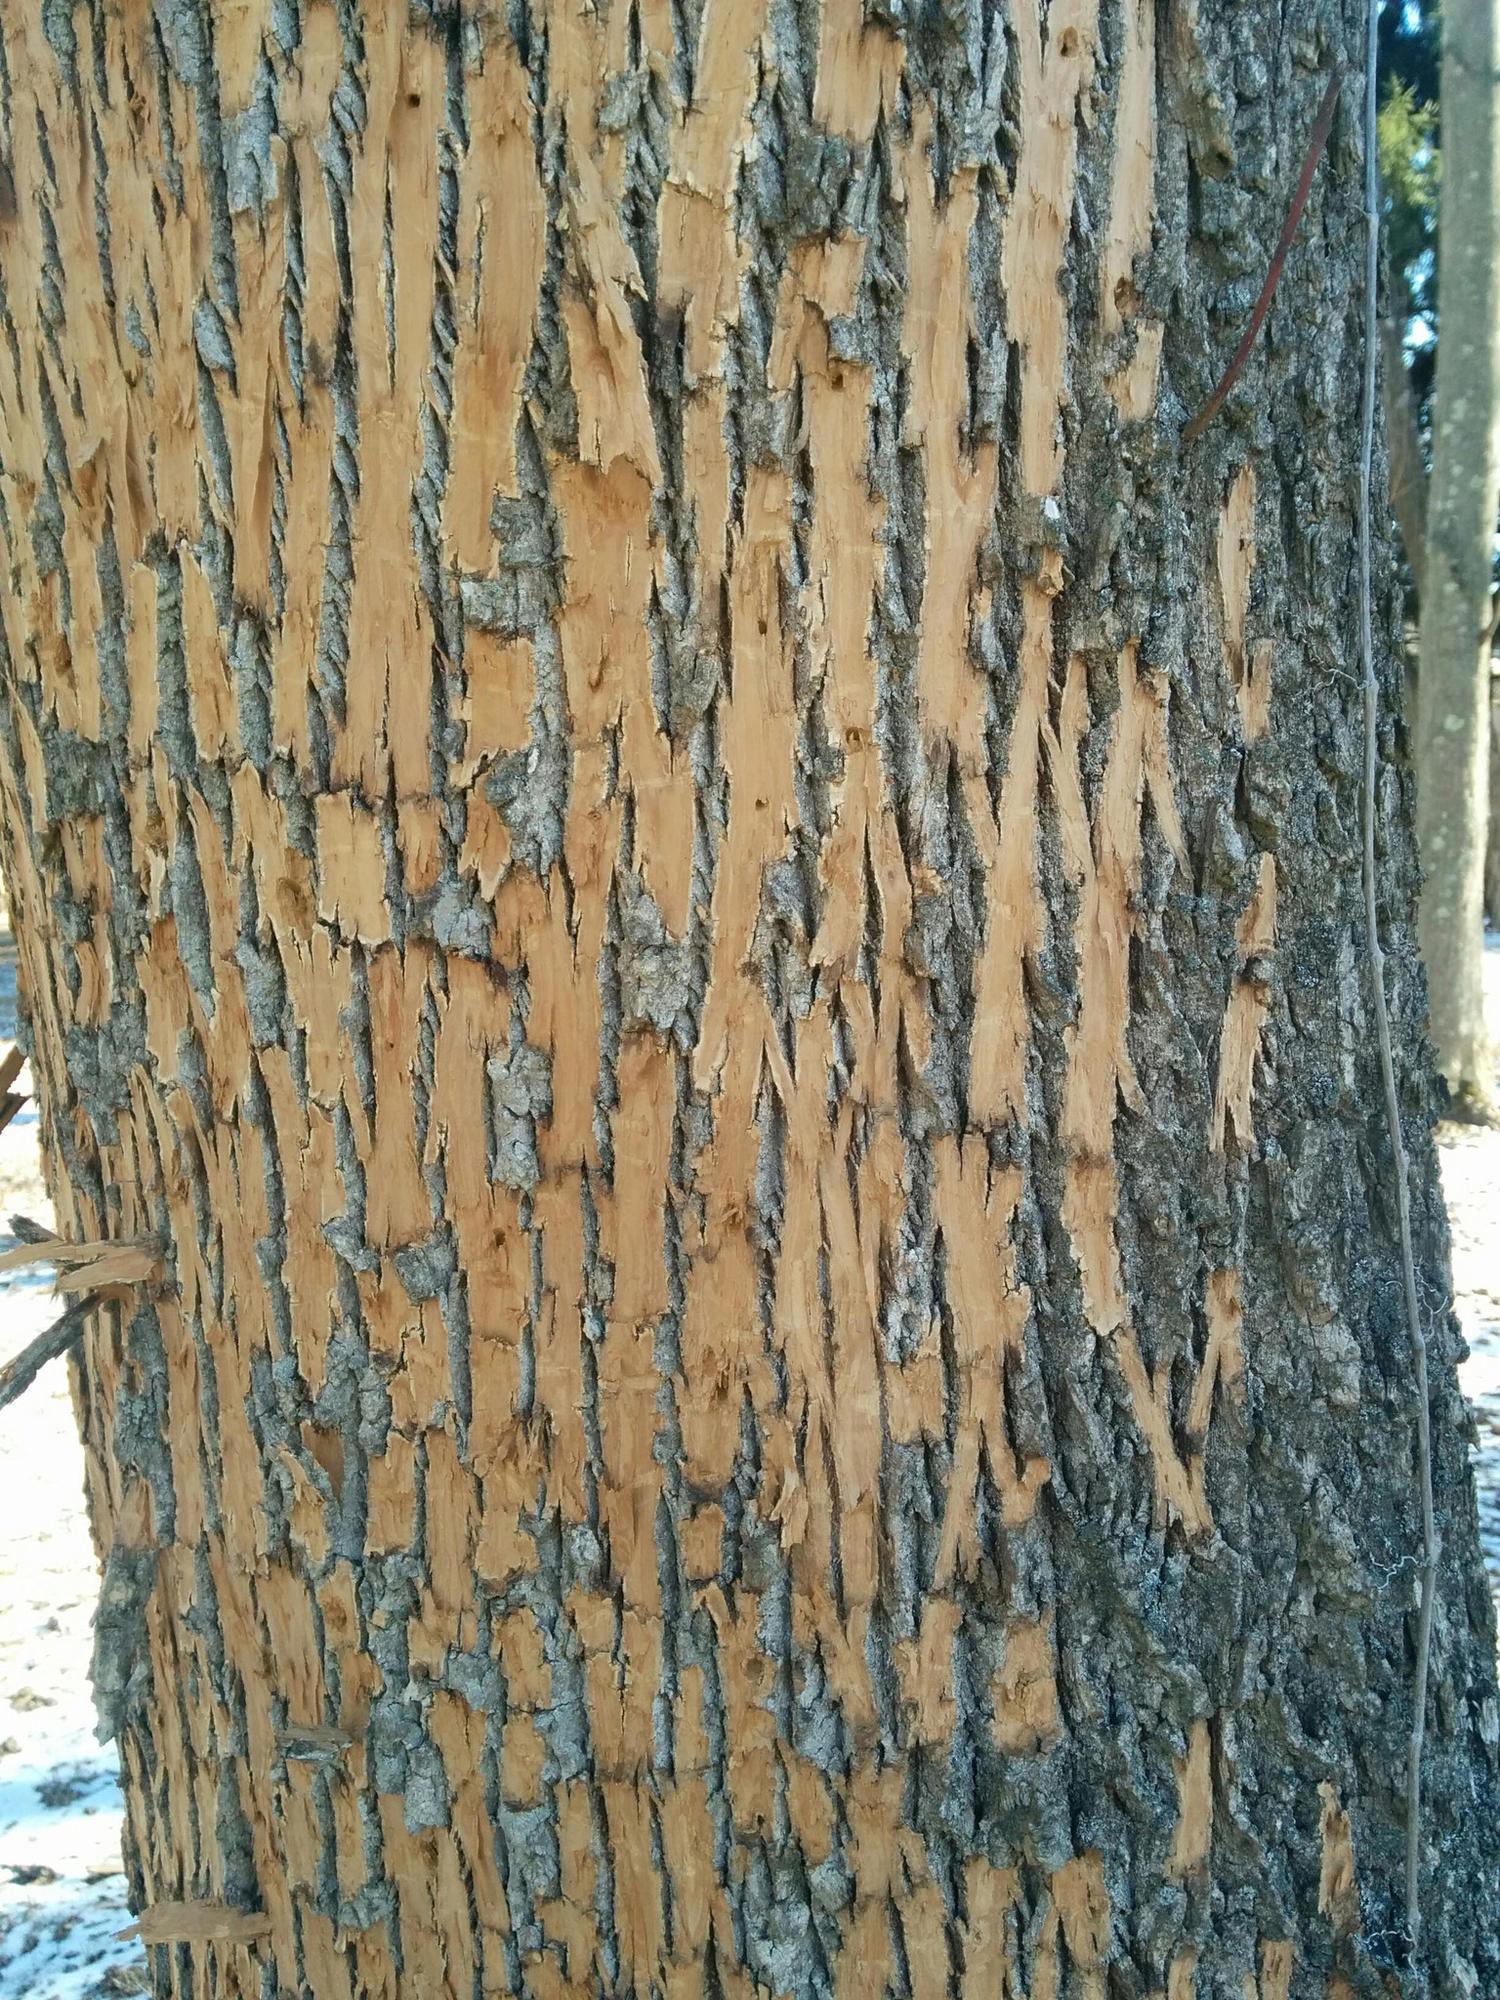 Peeling Bark Is Sign Of Emerald Ash Borer Baltimore Sun